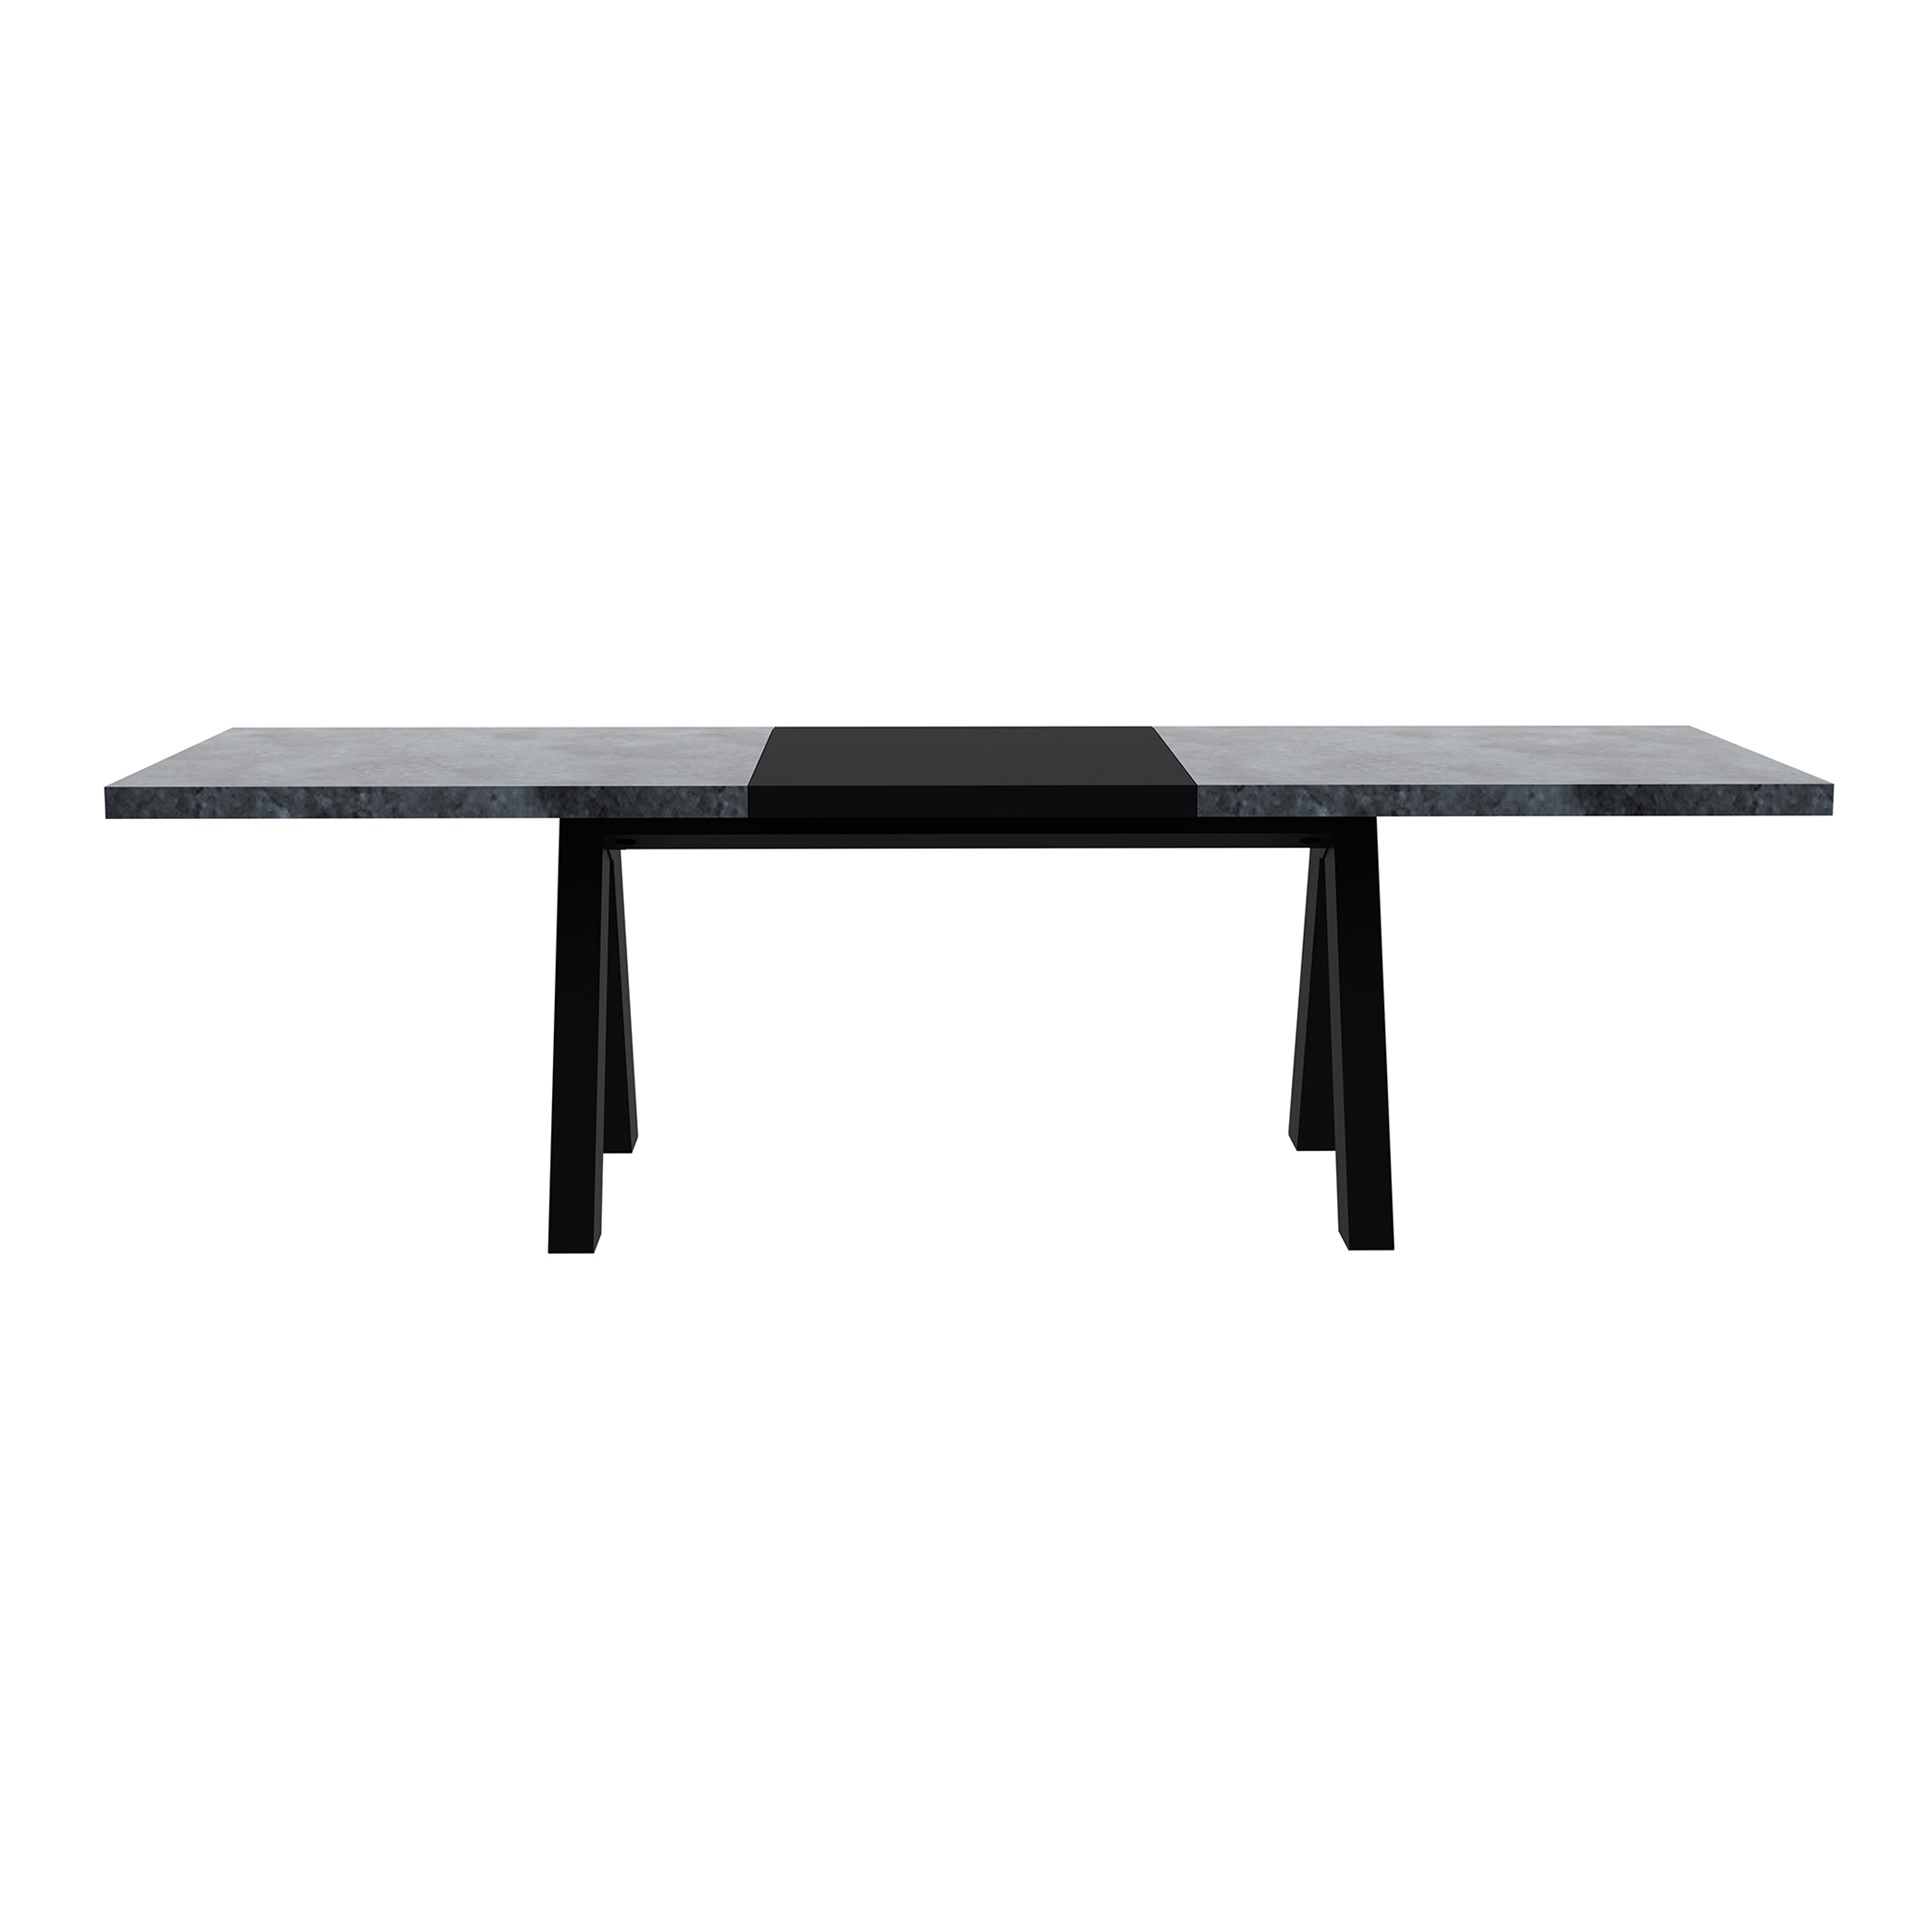 Apex Extending Concrete Dining Table